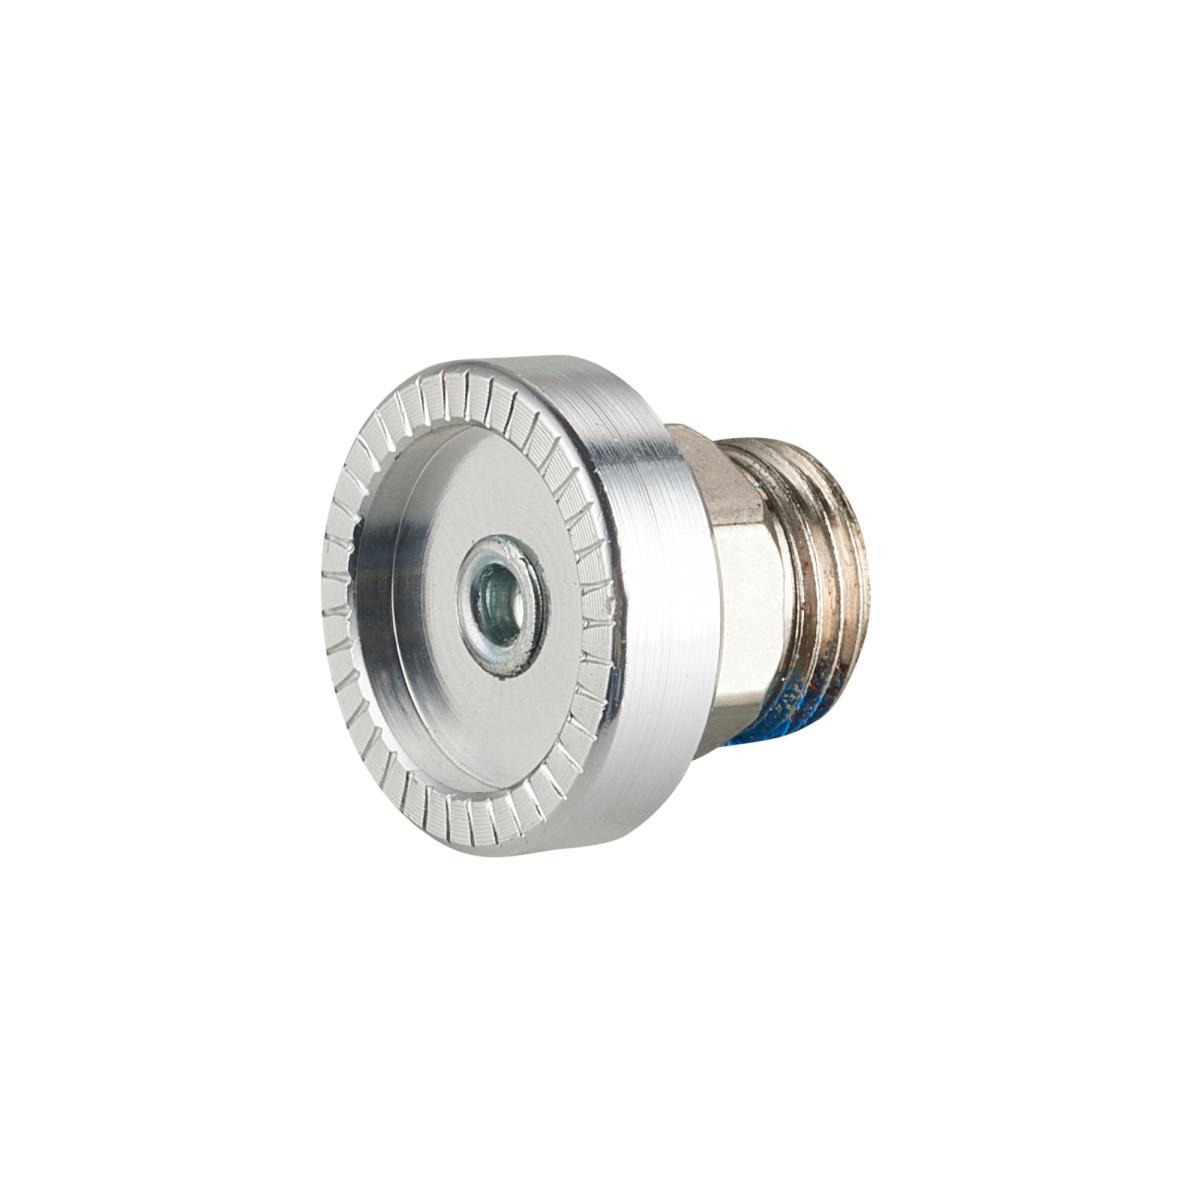 Push Button pro Cruiser - silver